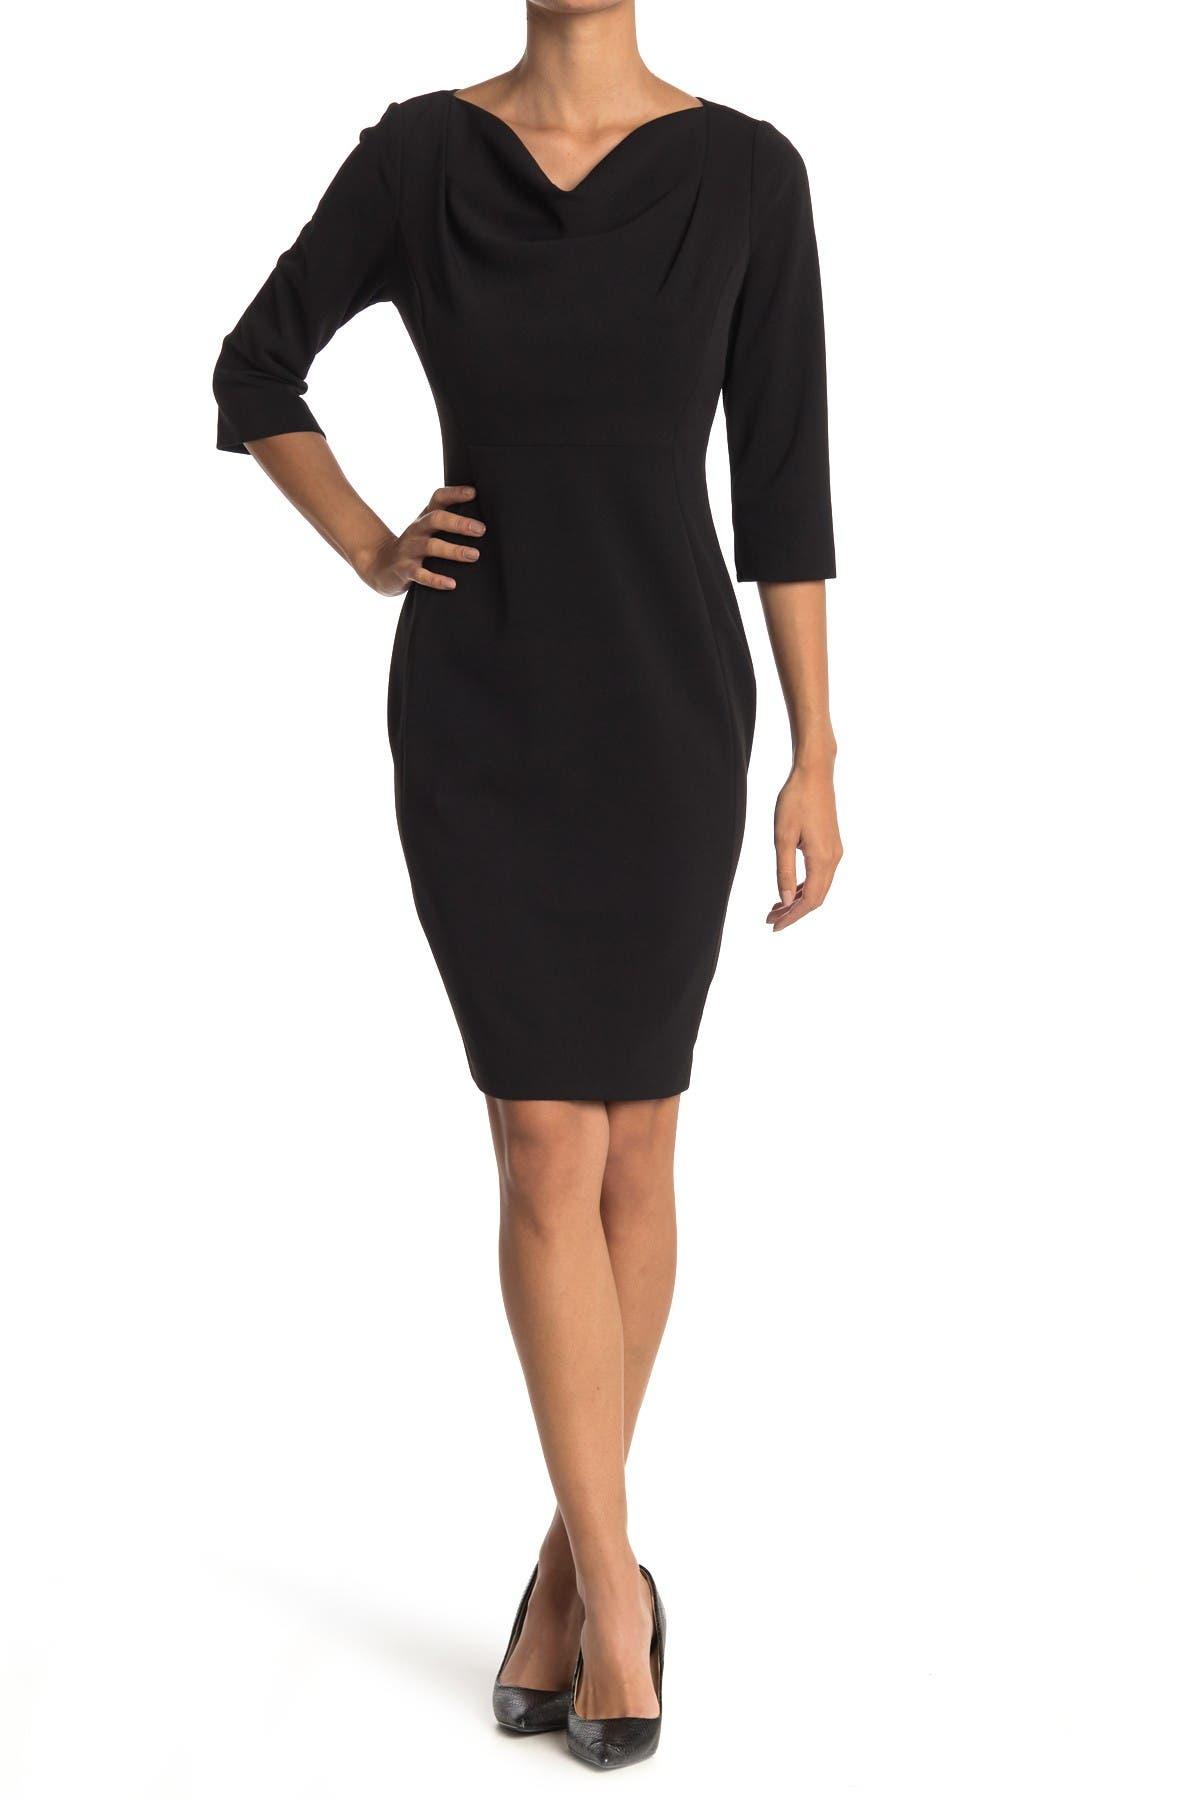 Image of Calvin Klein 3/4 Sleeve Cowl Neck Sheath Dress